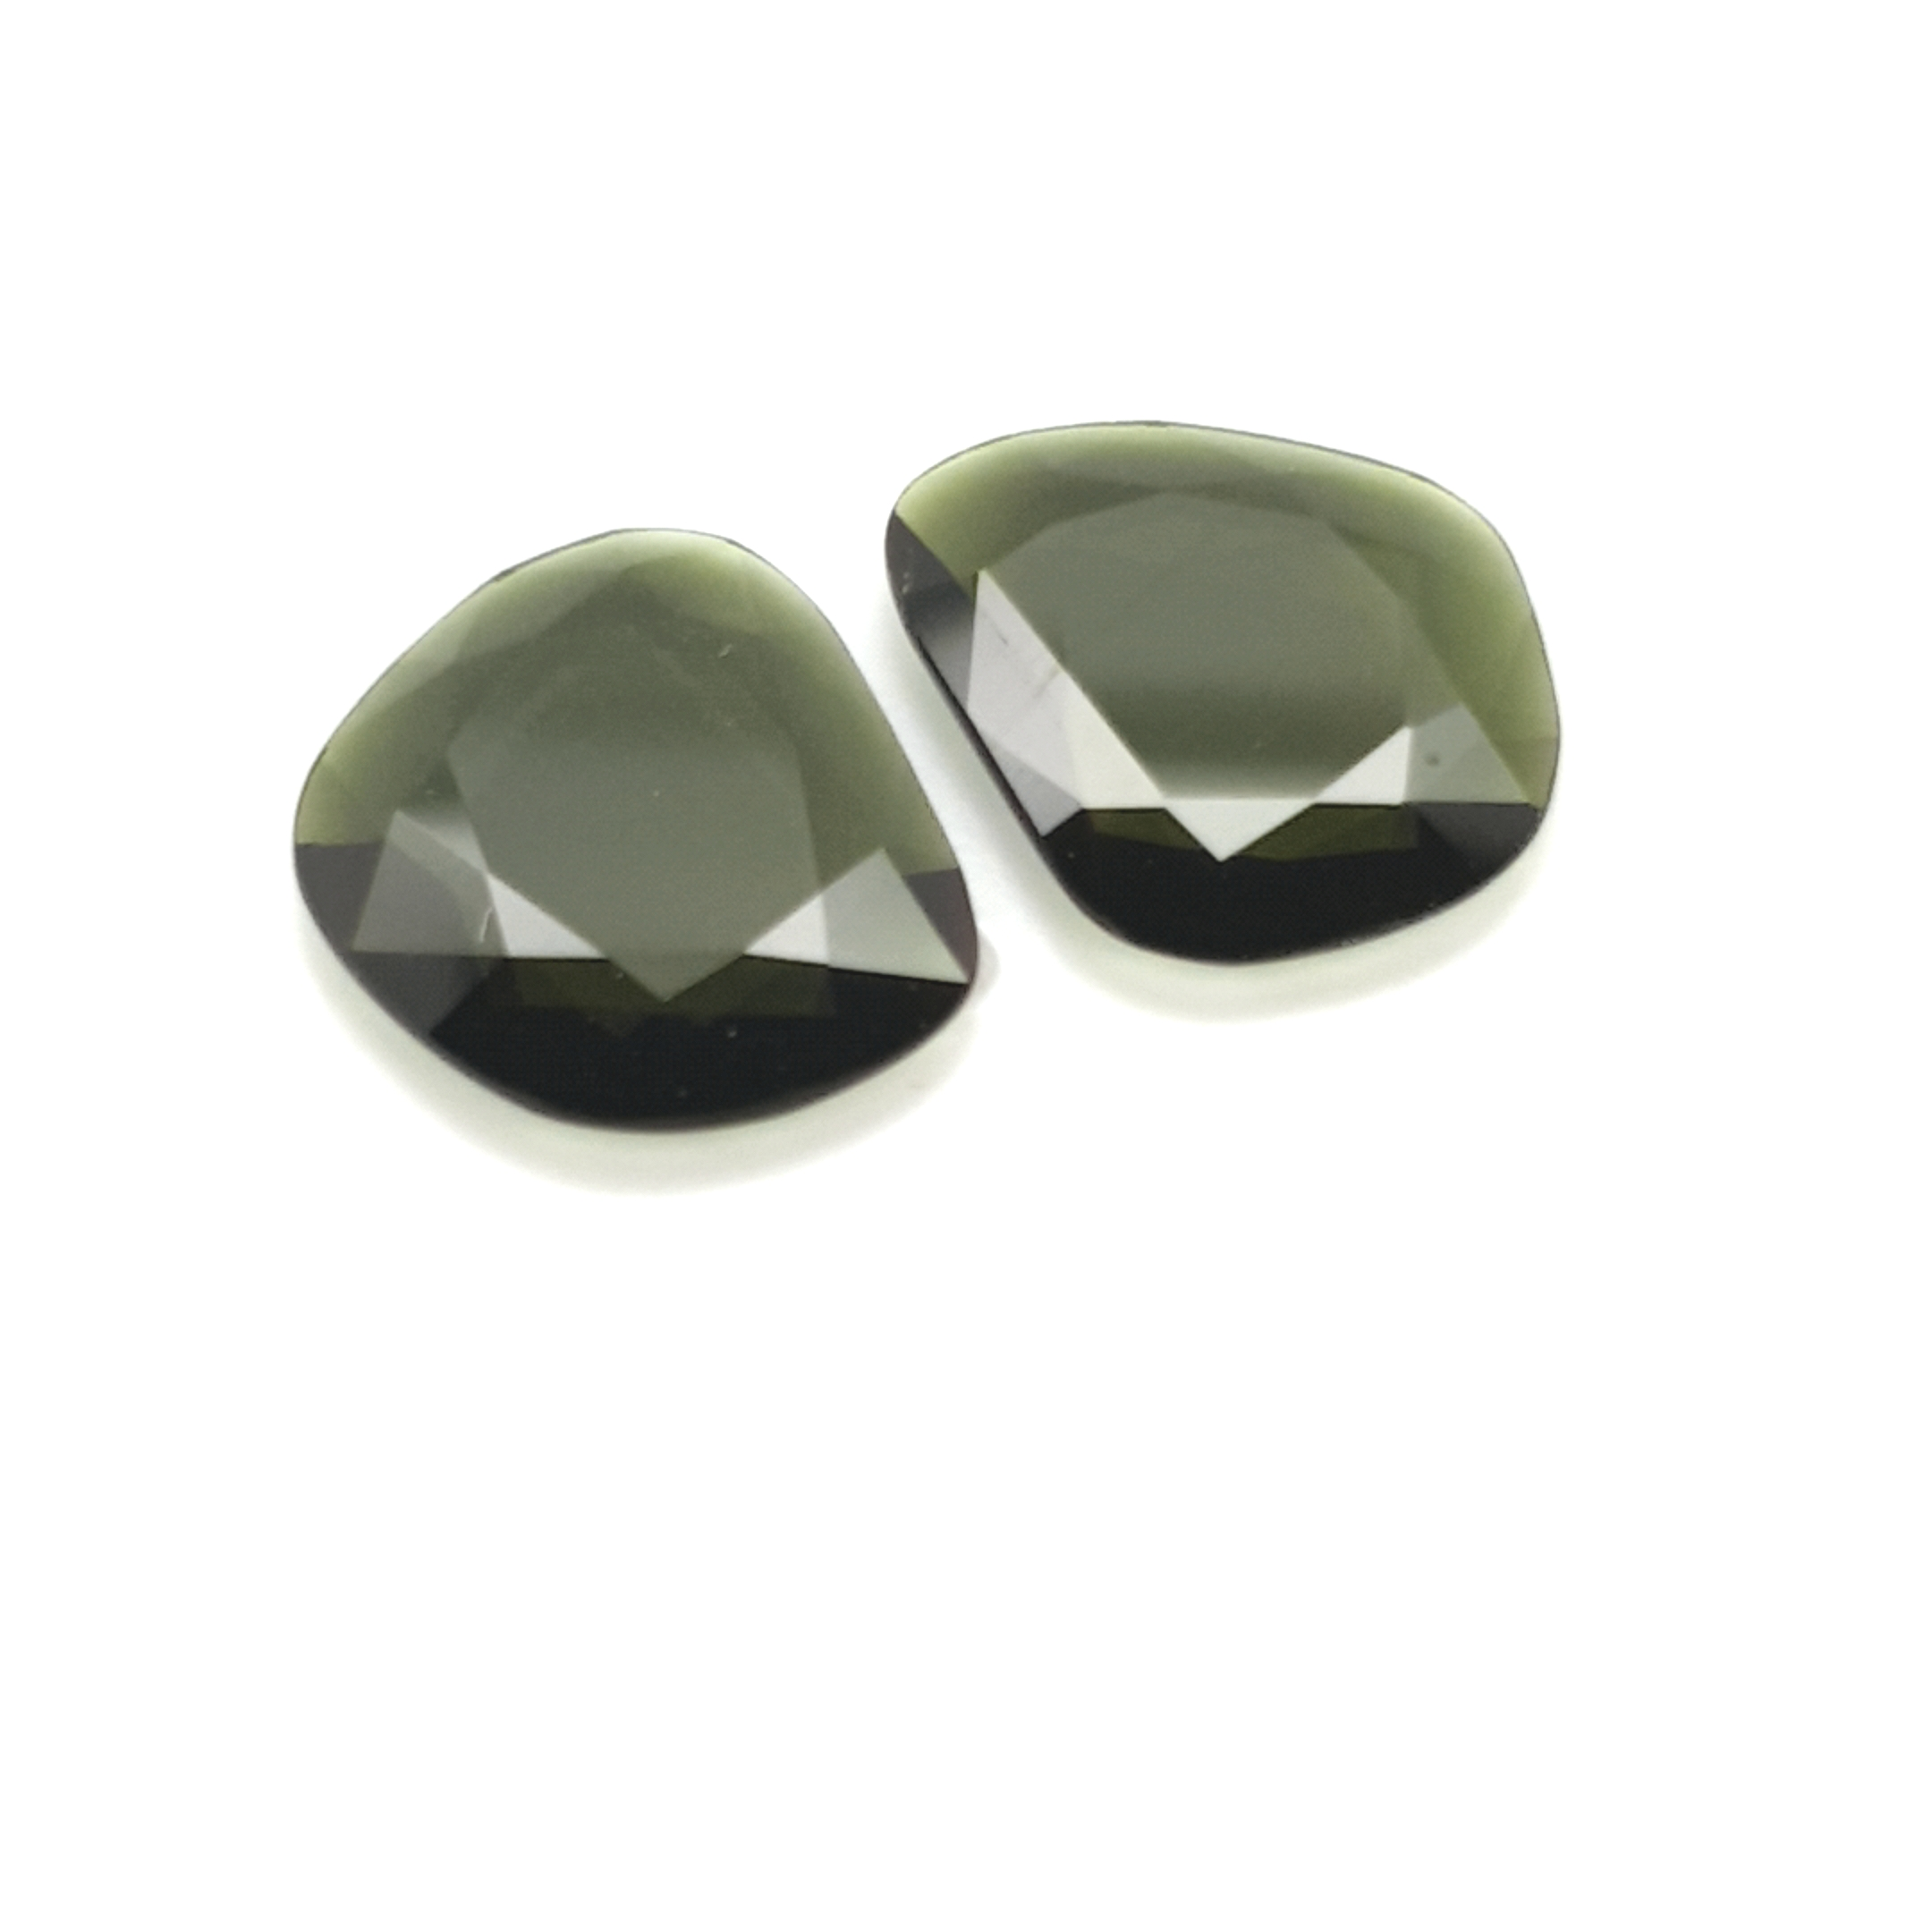 8,35ct.Pair Imperial Green Tourmalin DoubleRoseCut TMJ13C4 ClaudiaHamann__2021-02-11-20-41-45